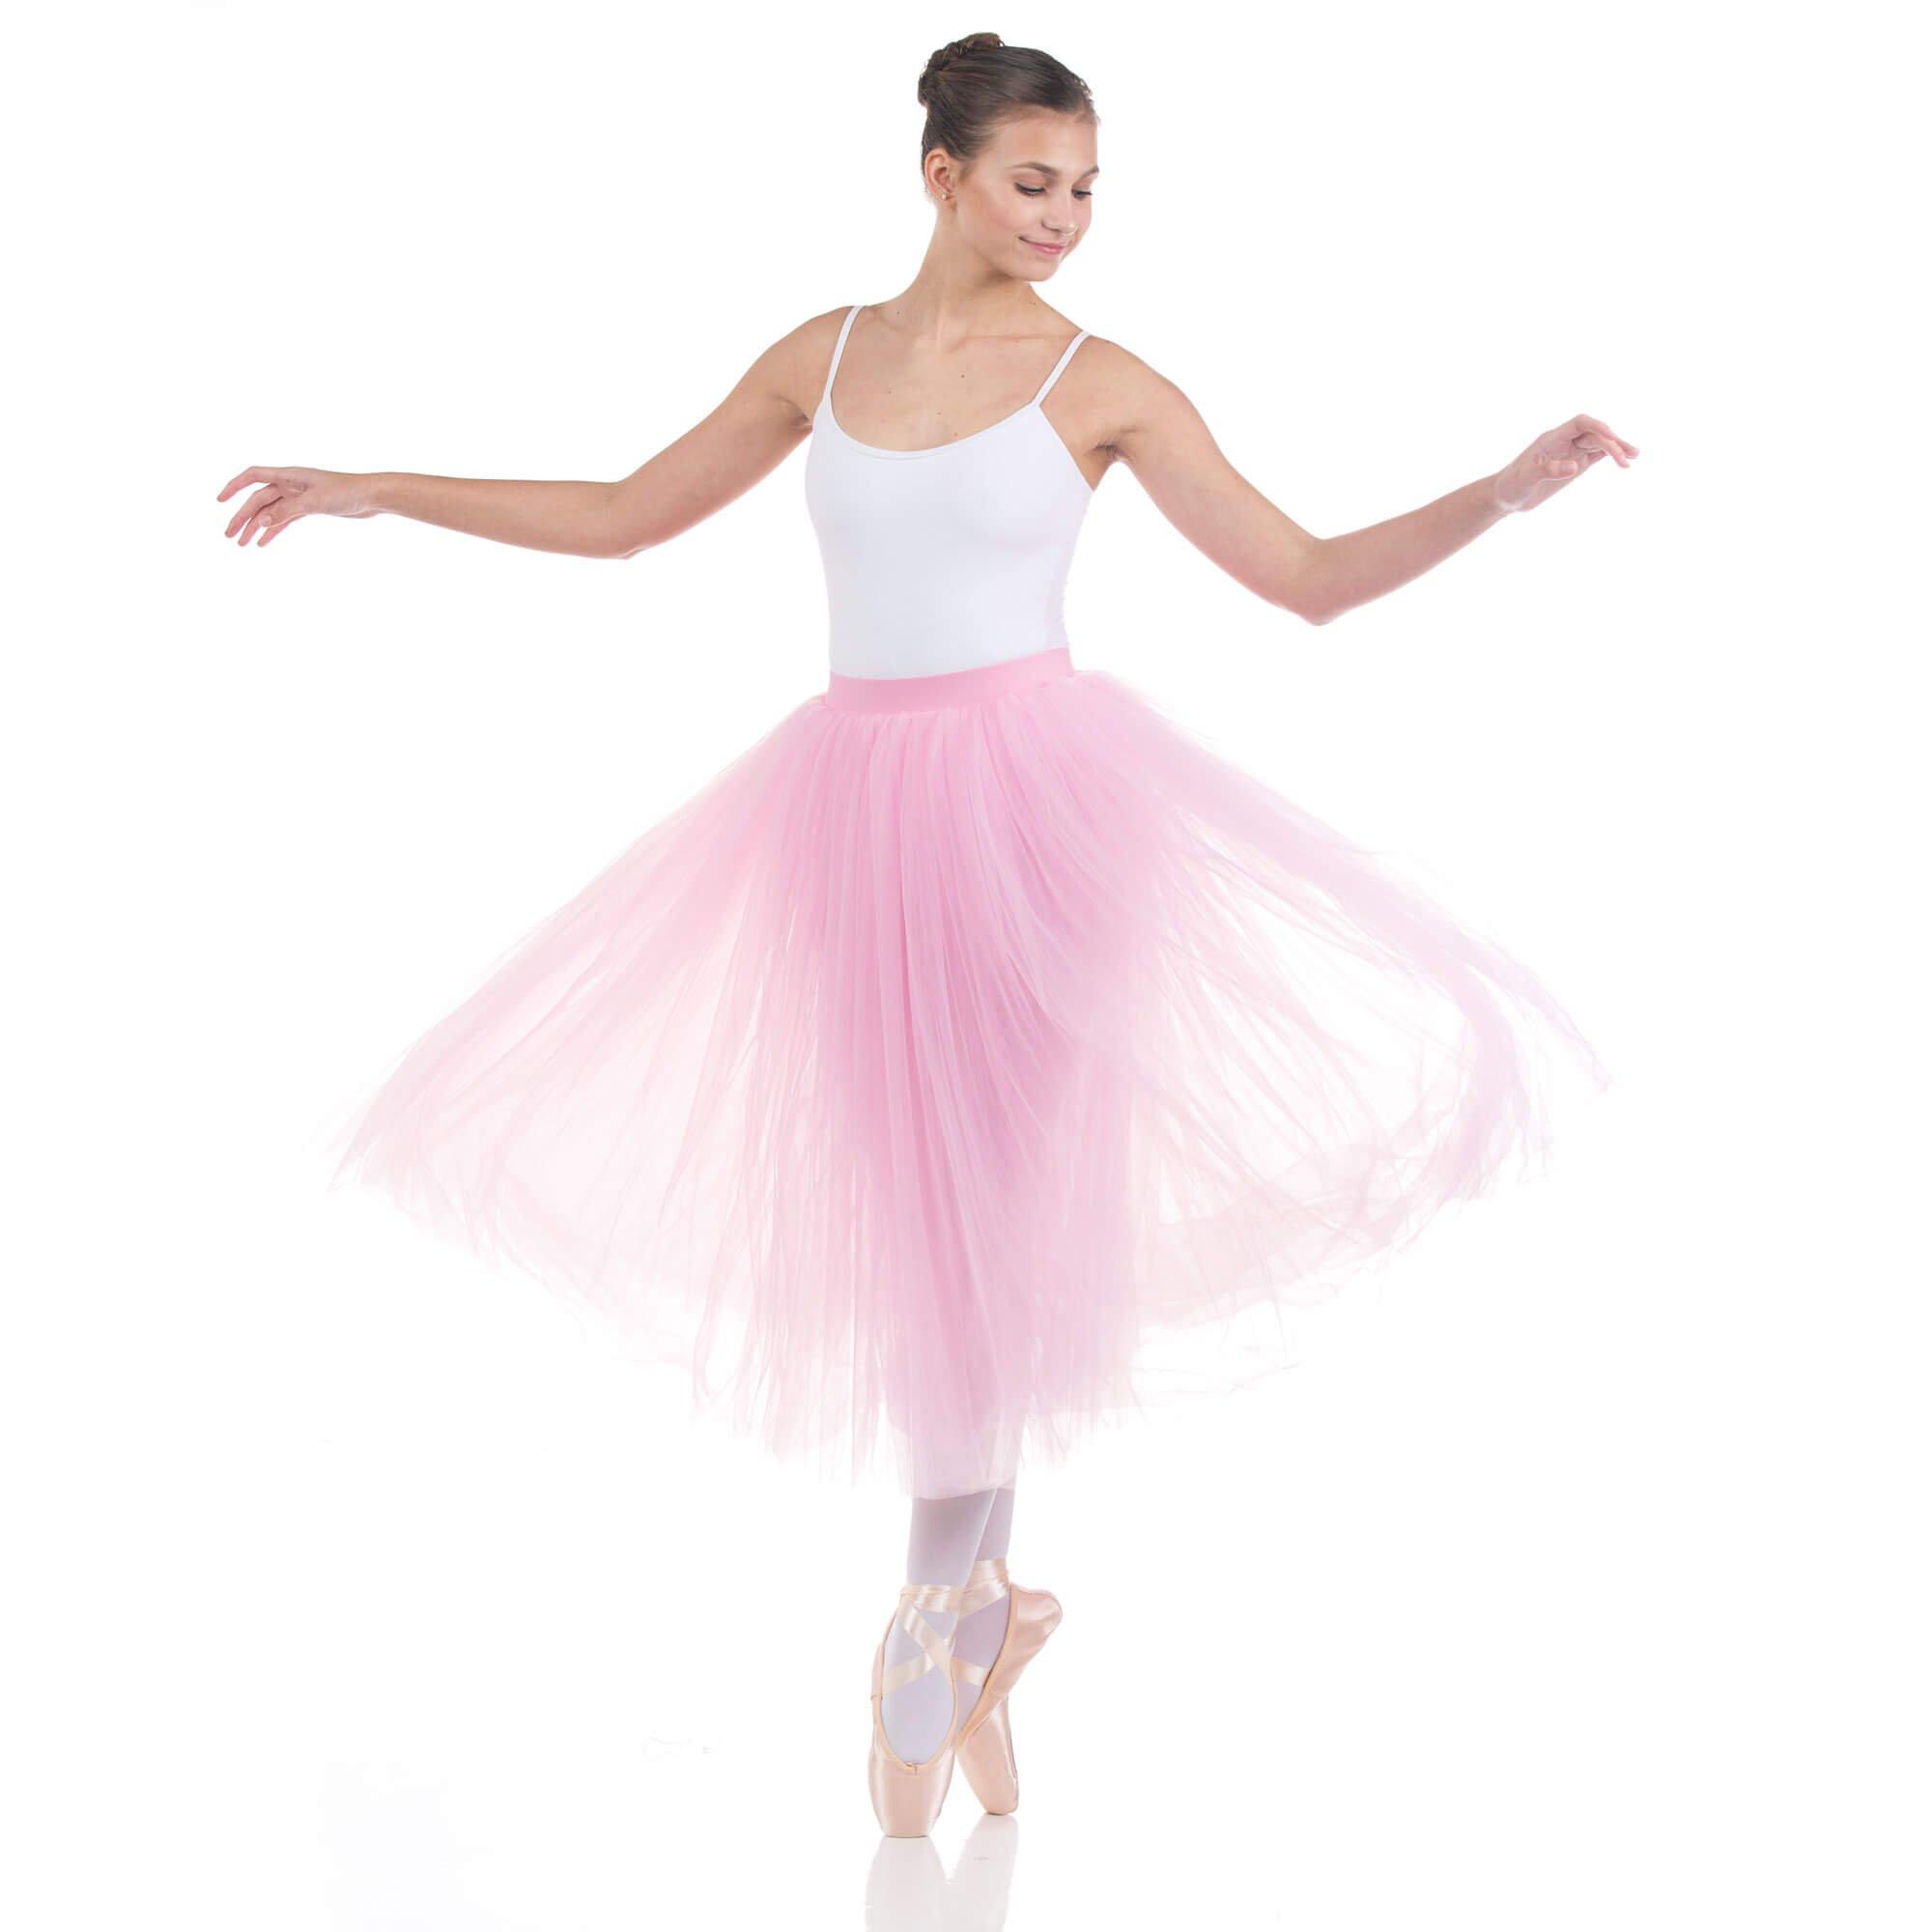 baiwu women's ballet long performance tutu skirt